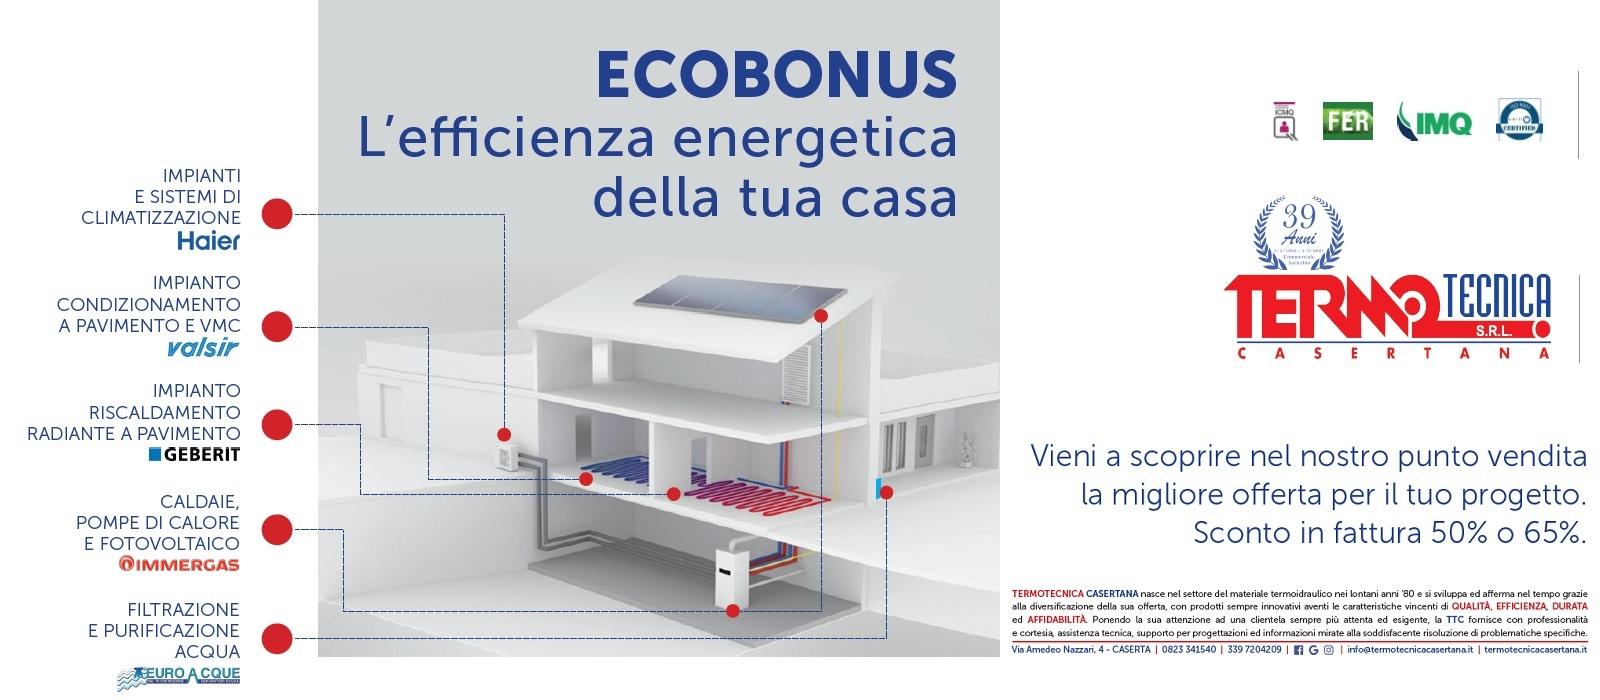 ecobonus0